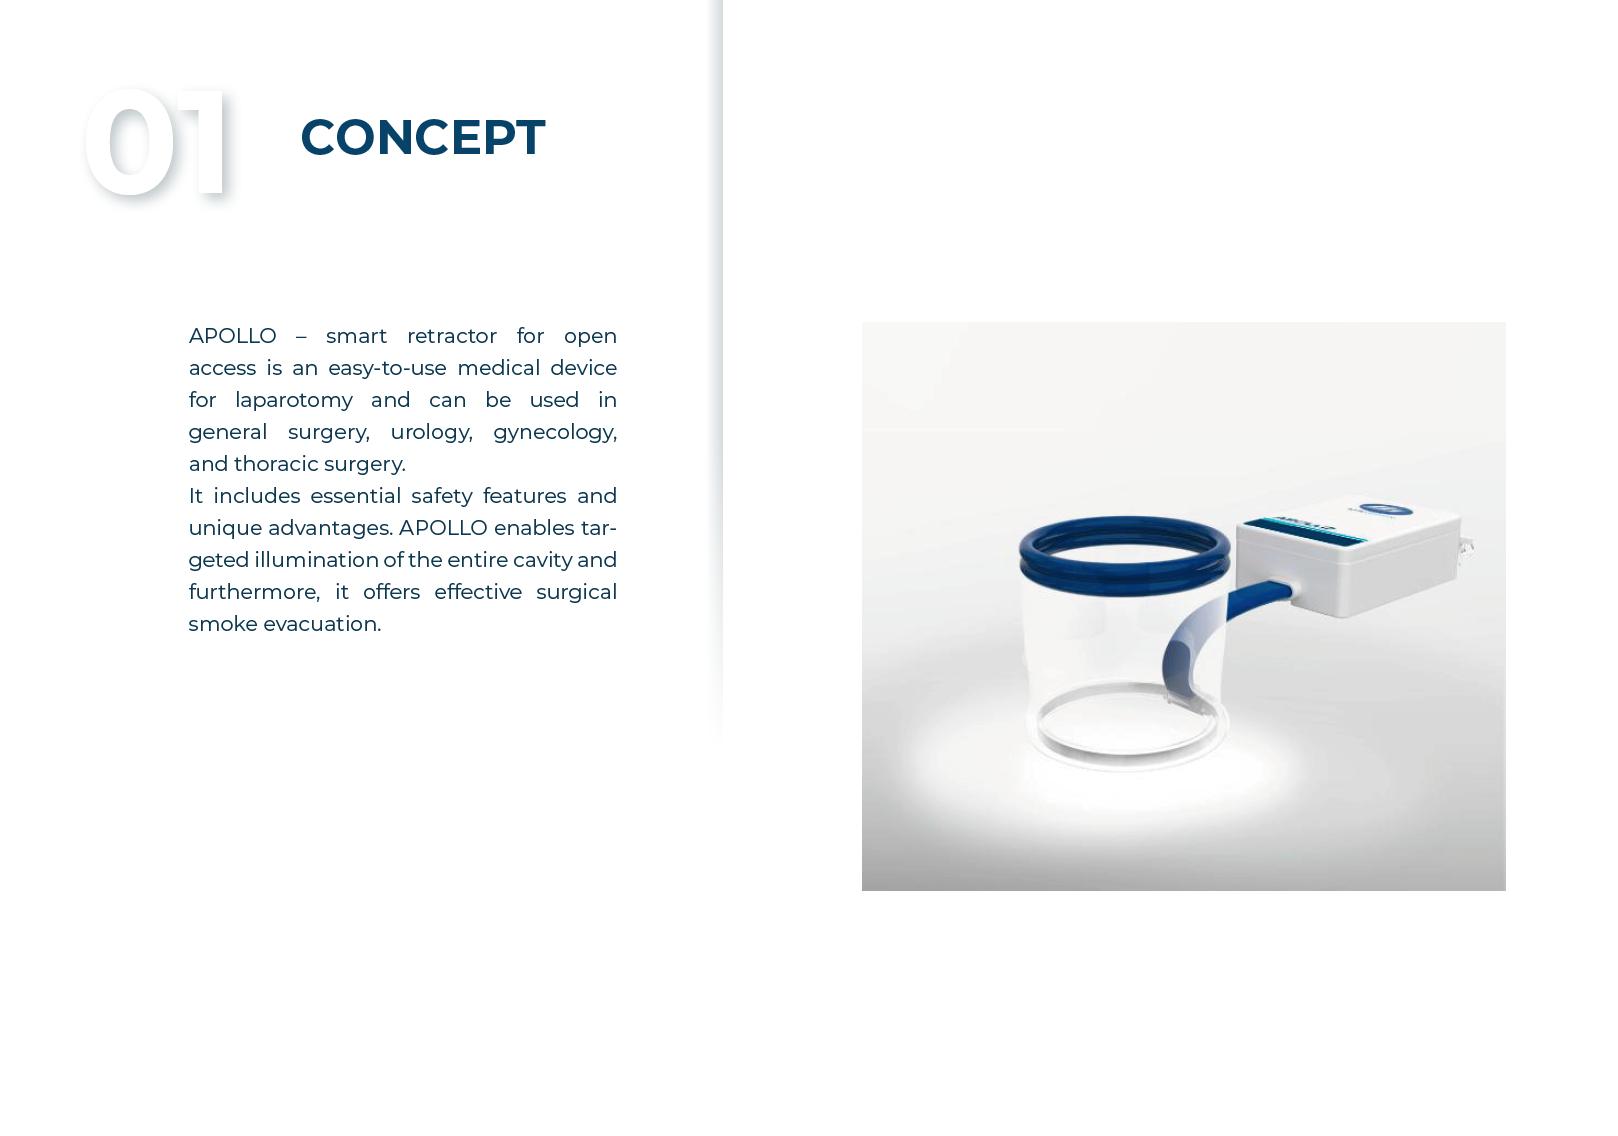 Product Brochure: Smart Retractor for Open Acces